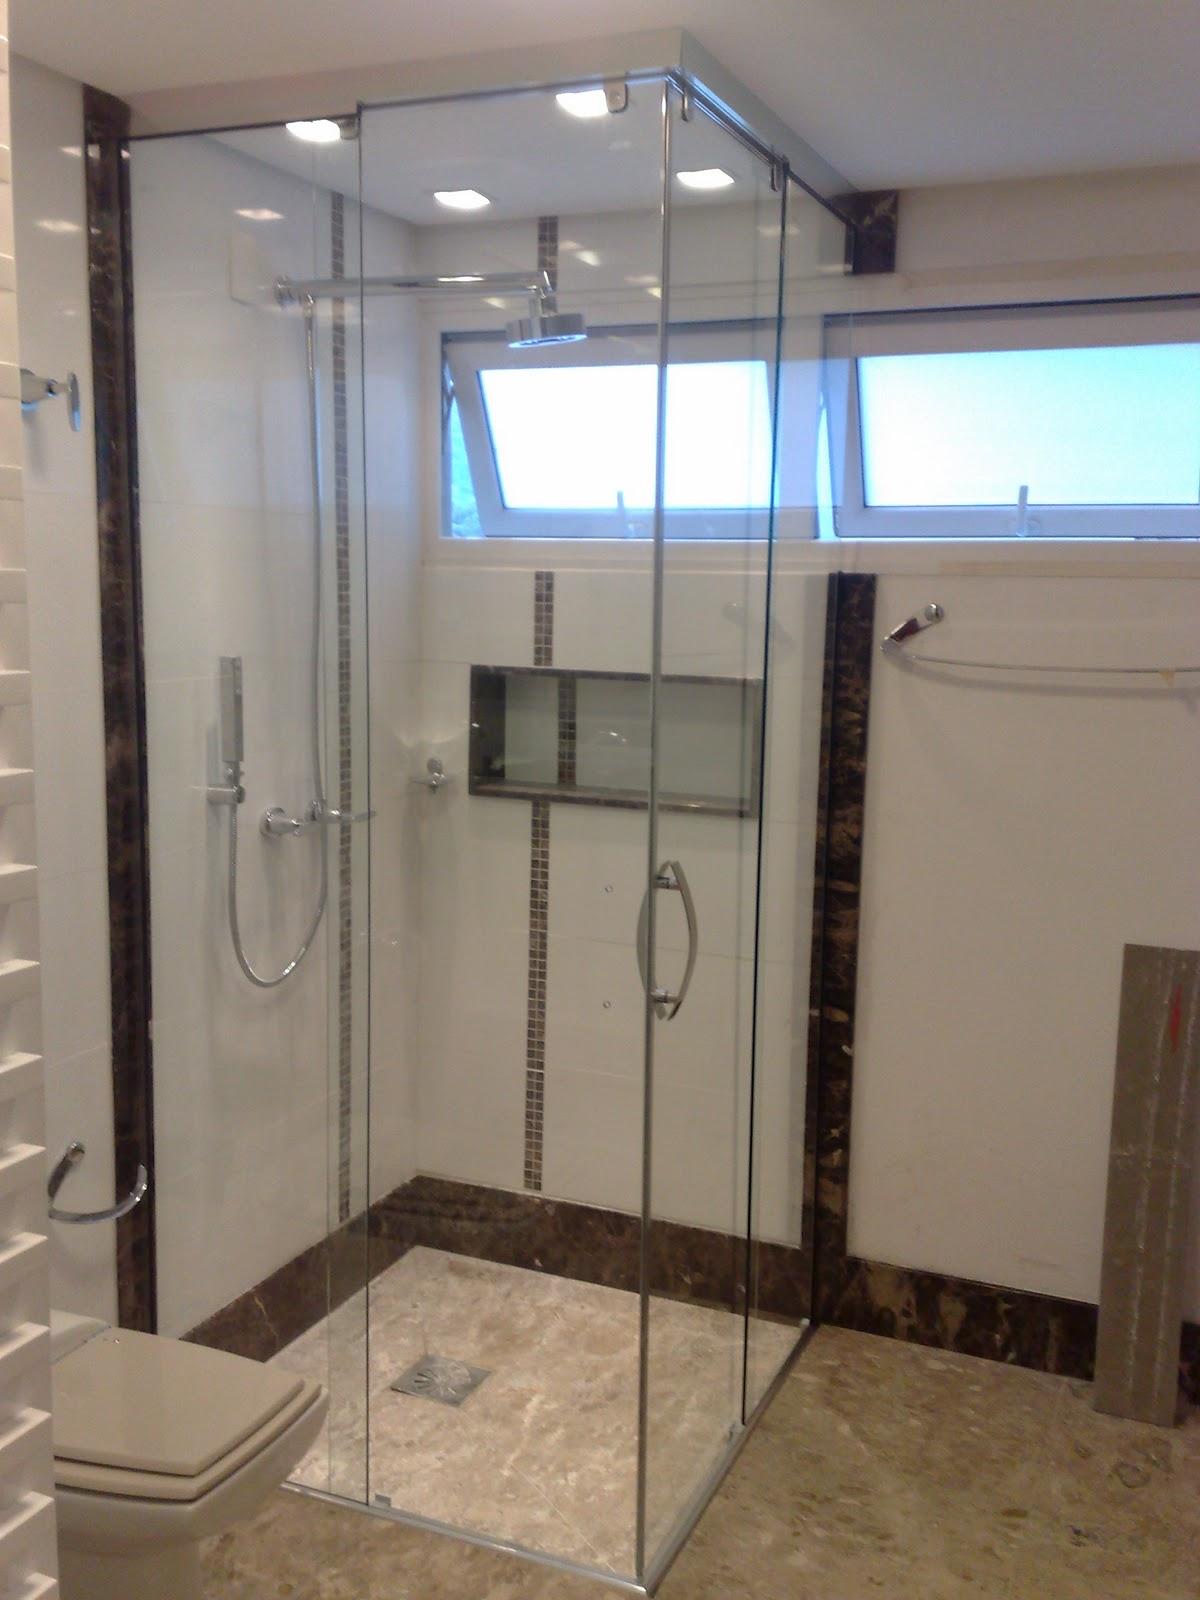 Dicas de todos os tipos ;): Banheiro: box de vidro até o teto #2766A4 1200x1600 Banheiro Azulejo Ate O Teto